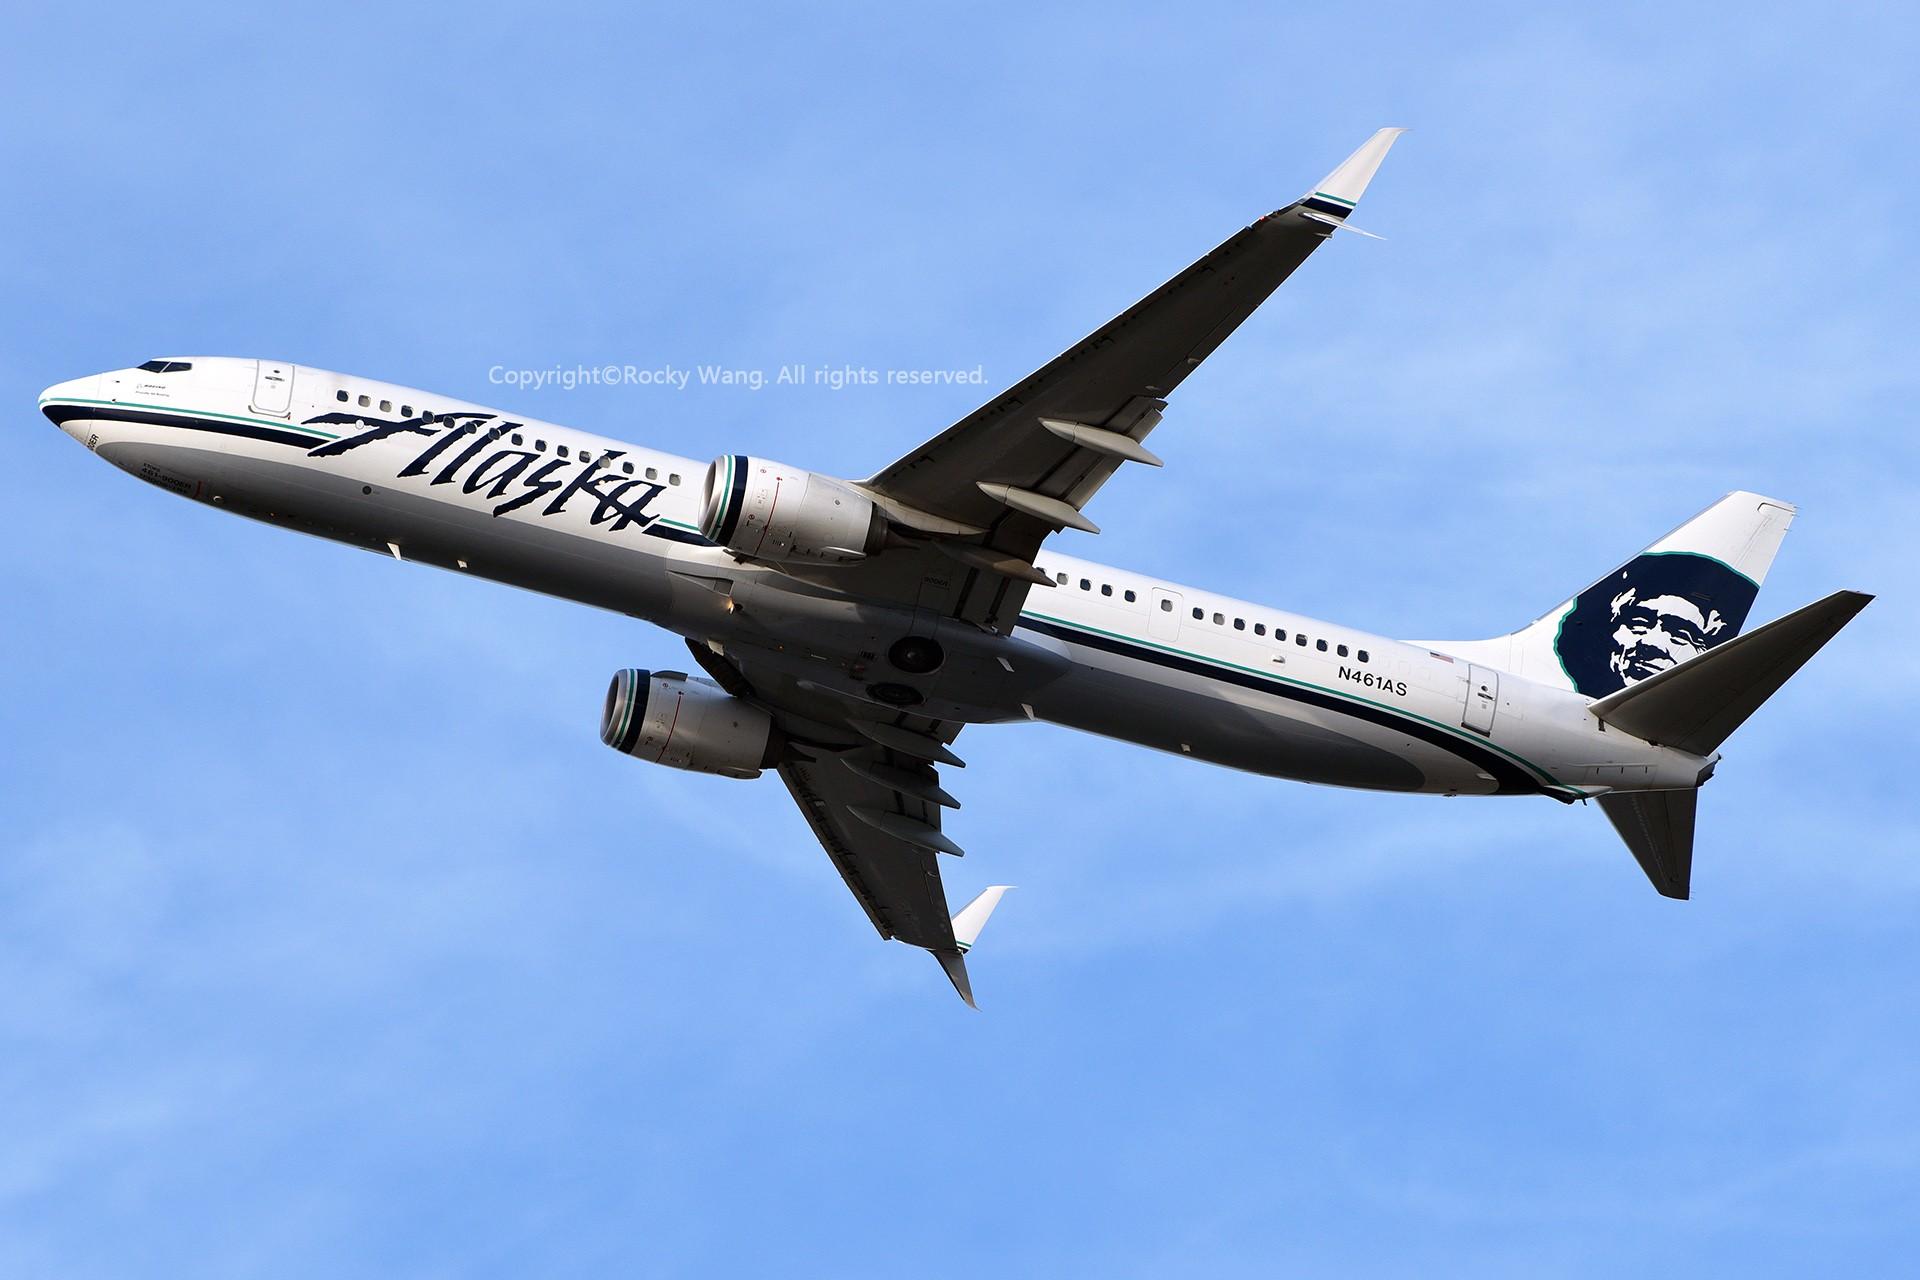 Re:[原创]窄体连连看 BOEING 737-990ER N461AS 美国西雅图机场